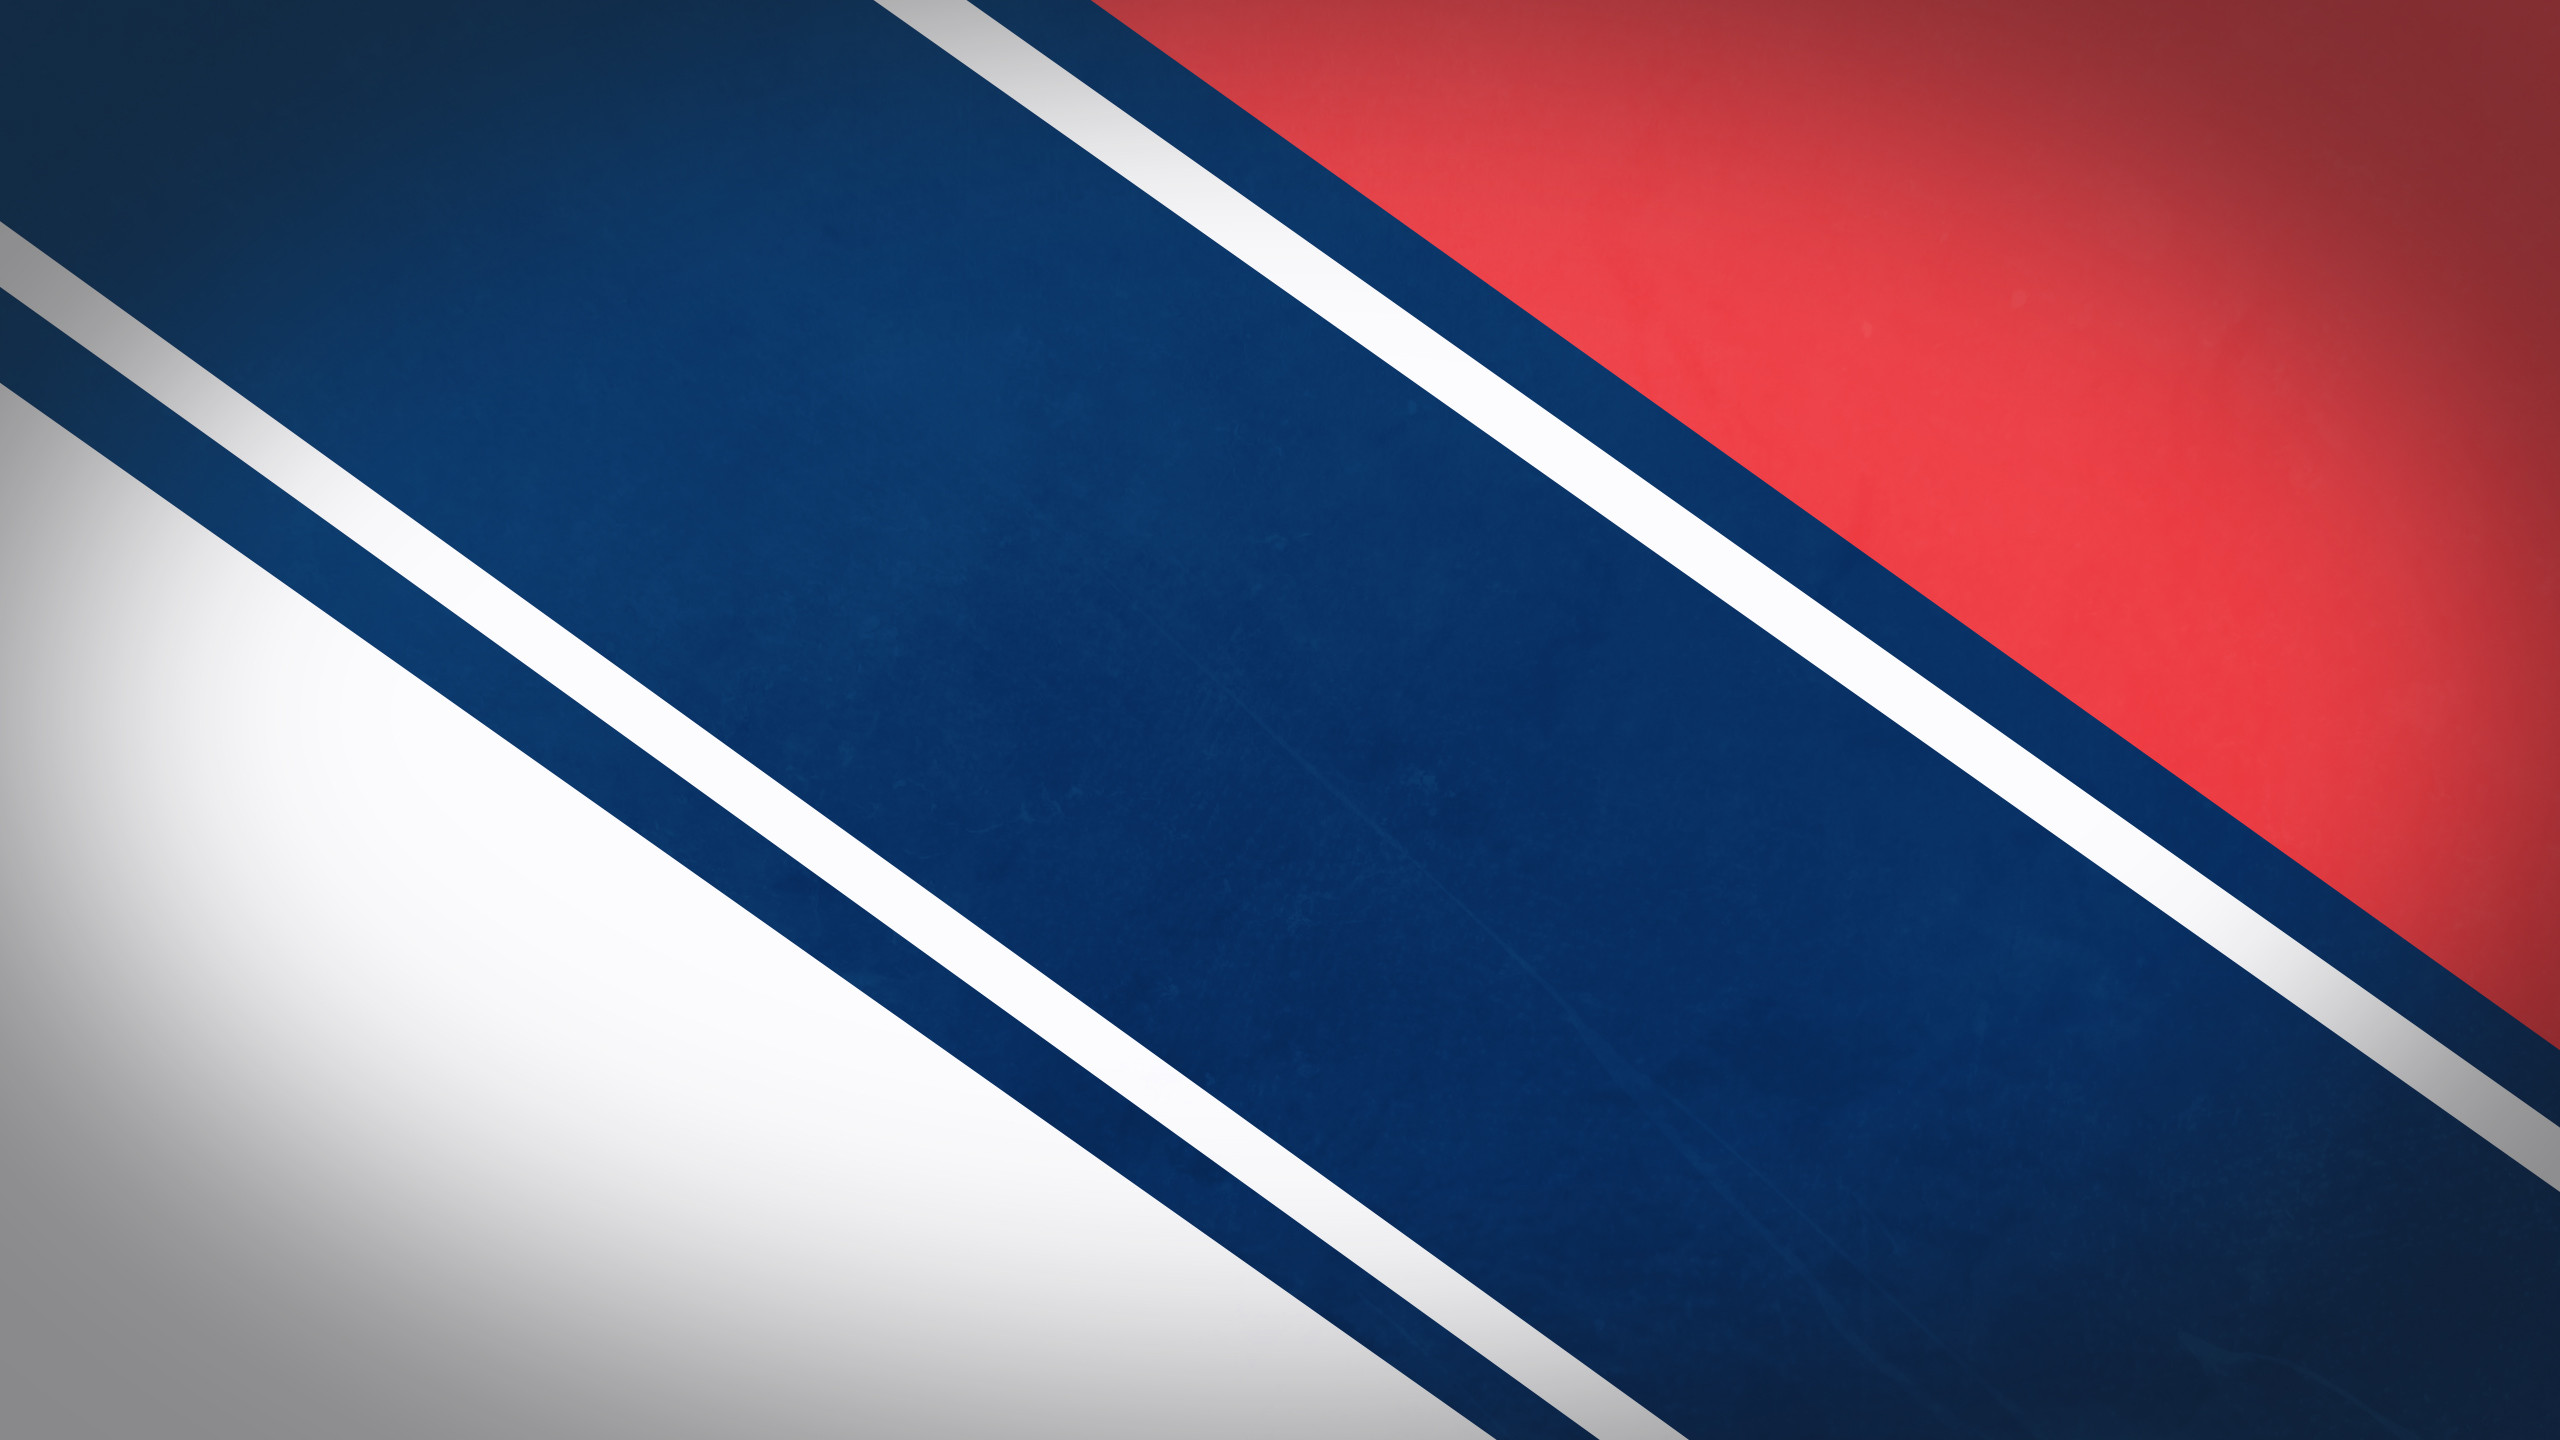 Download New York Rangers Wallpaper 15383 2560x1440 px 2560x1440